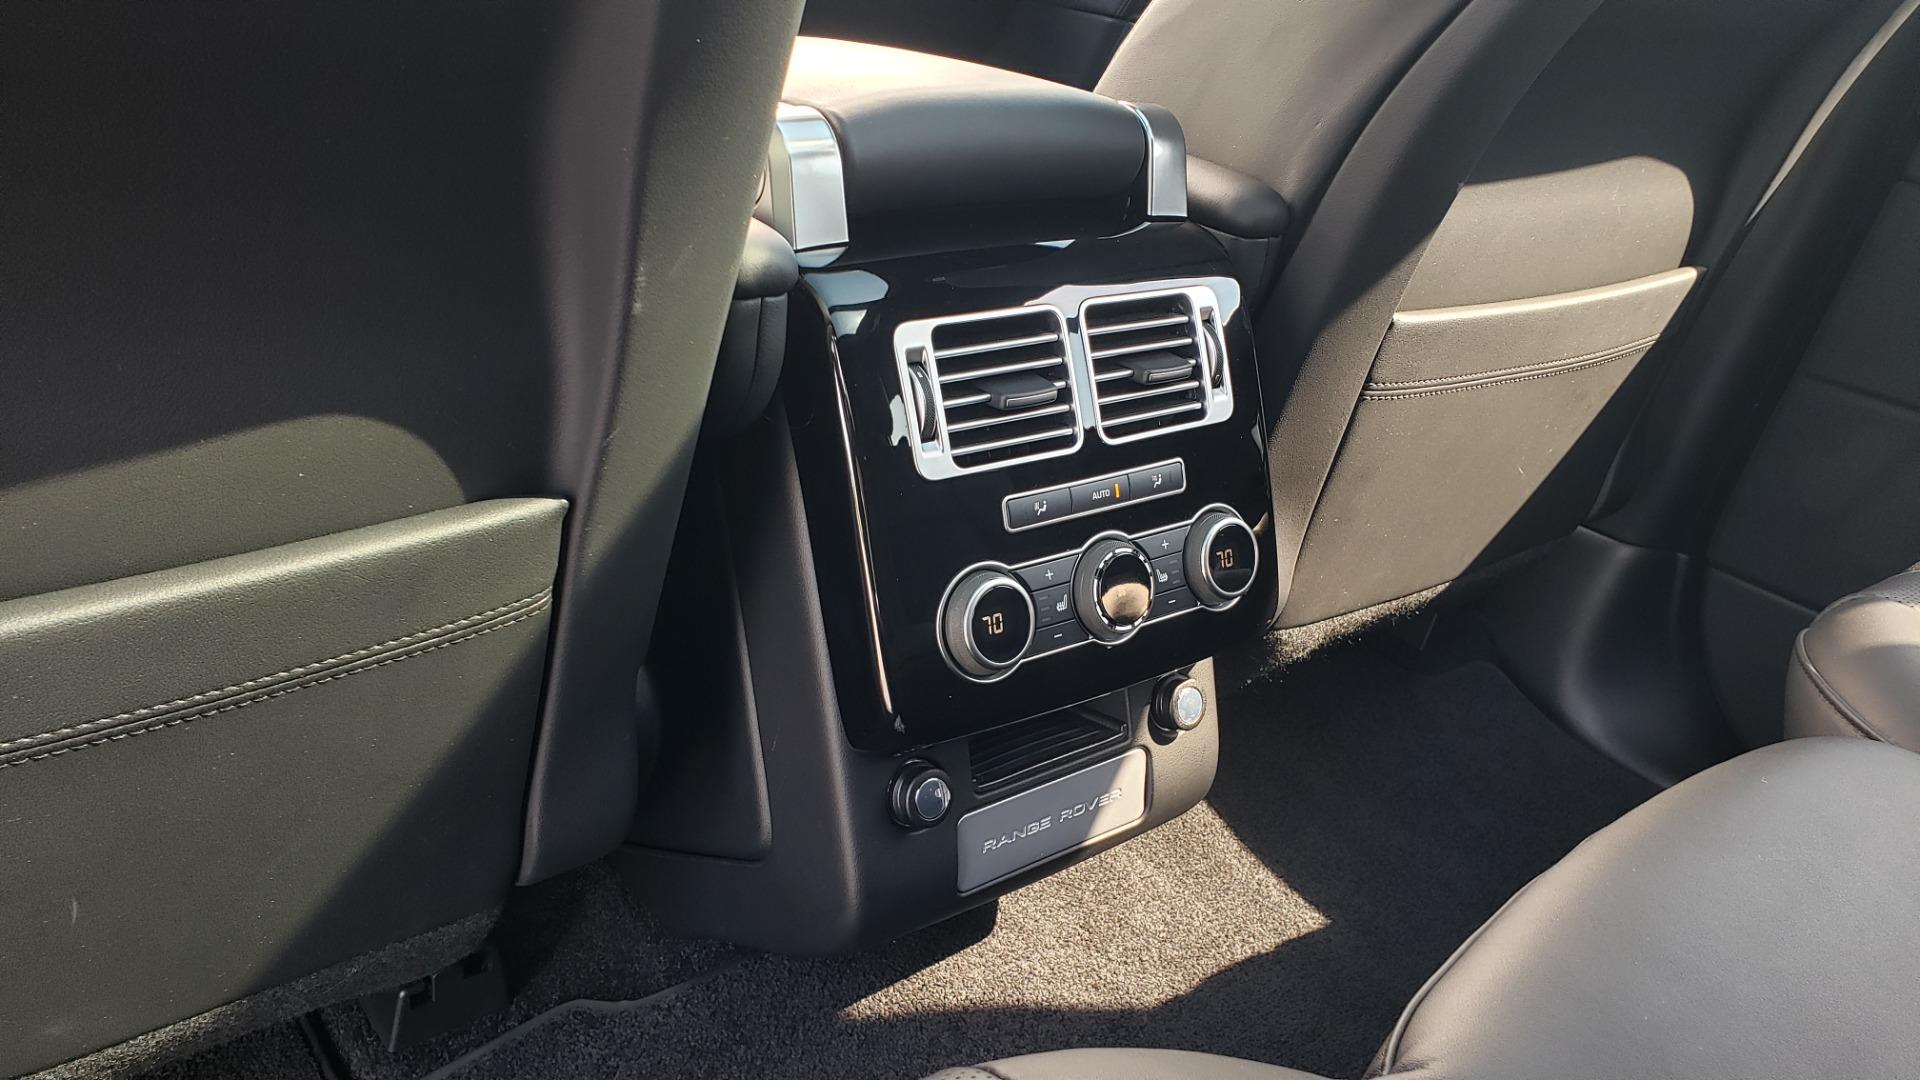 Used 2017 Land Rover RANGE ROVER SC V8 / VISION ASST / DRIVE PKG / MERIDIAN SOUND / PANO-ROOF / NAV / BSM for sale $75,995 at Formula Imports in Charlotte NC 28227 70